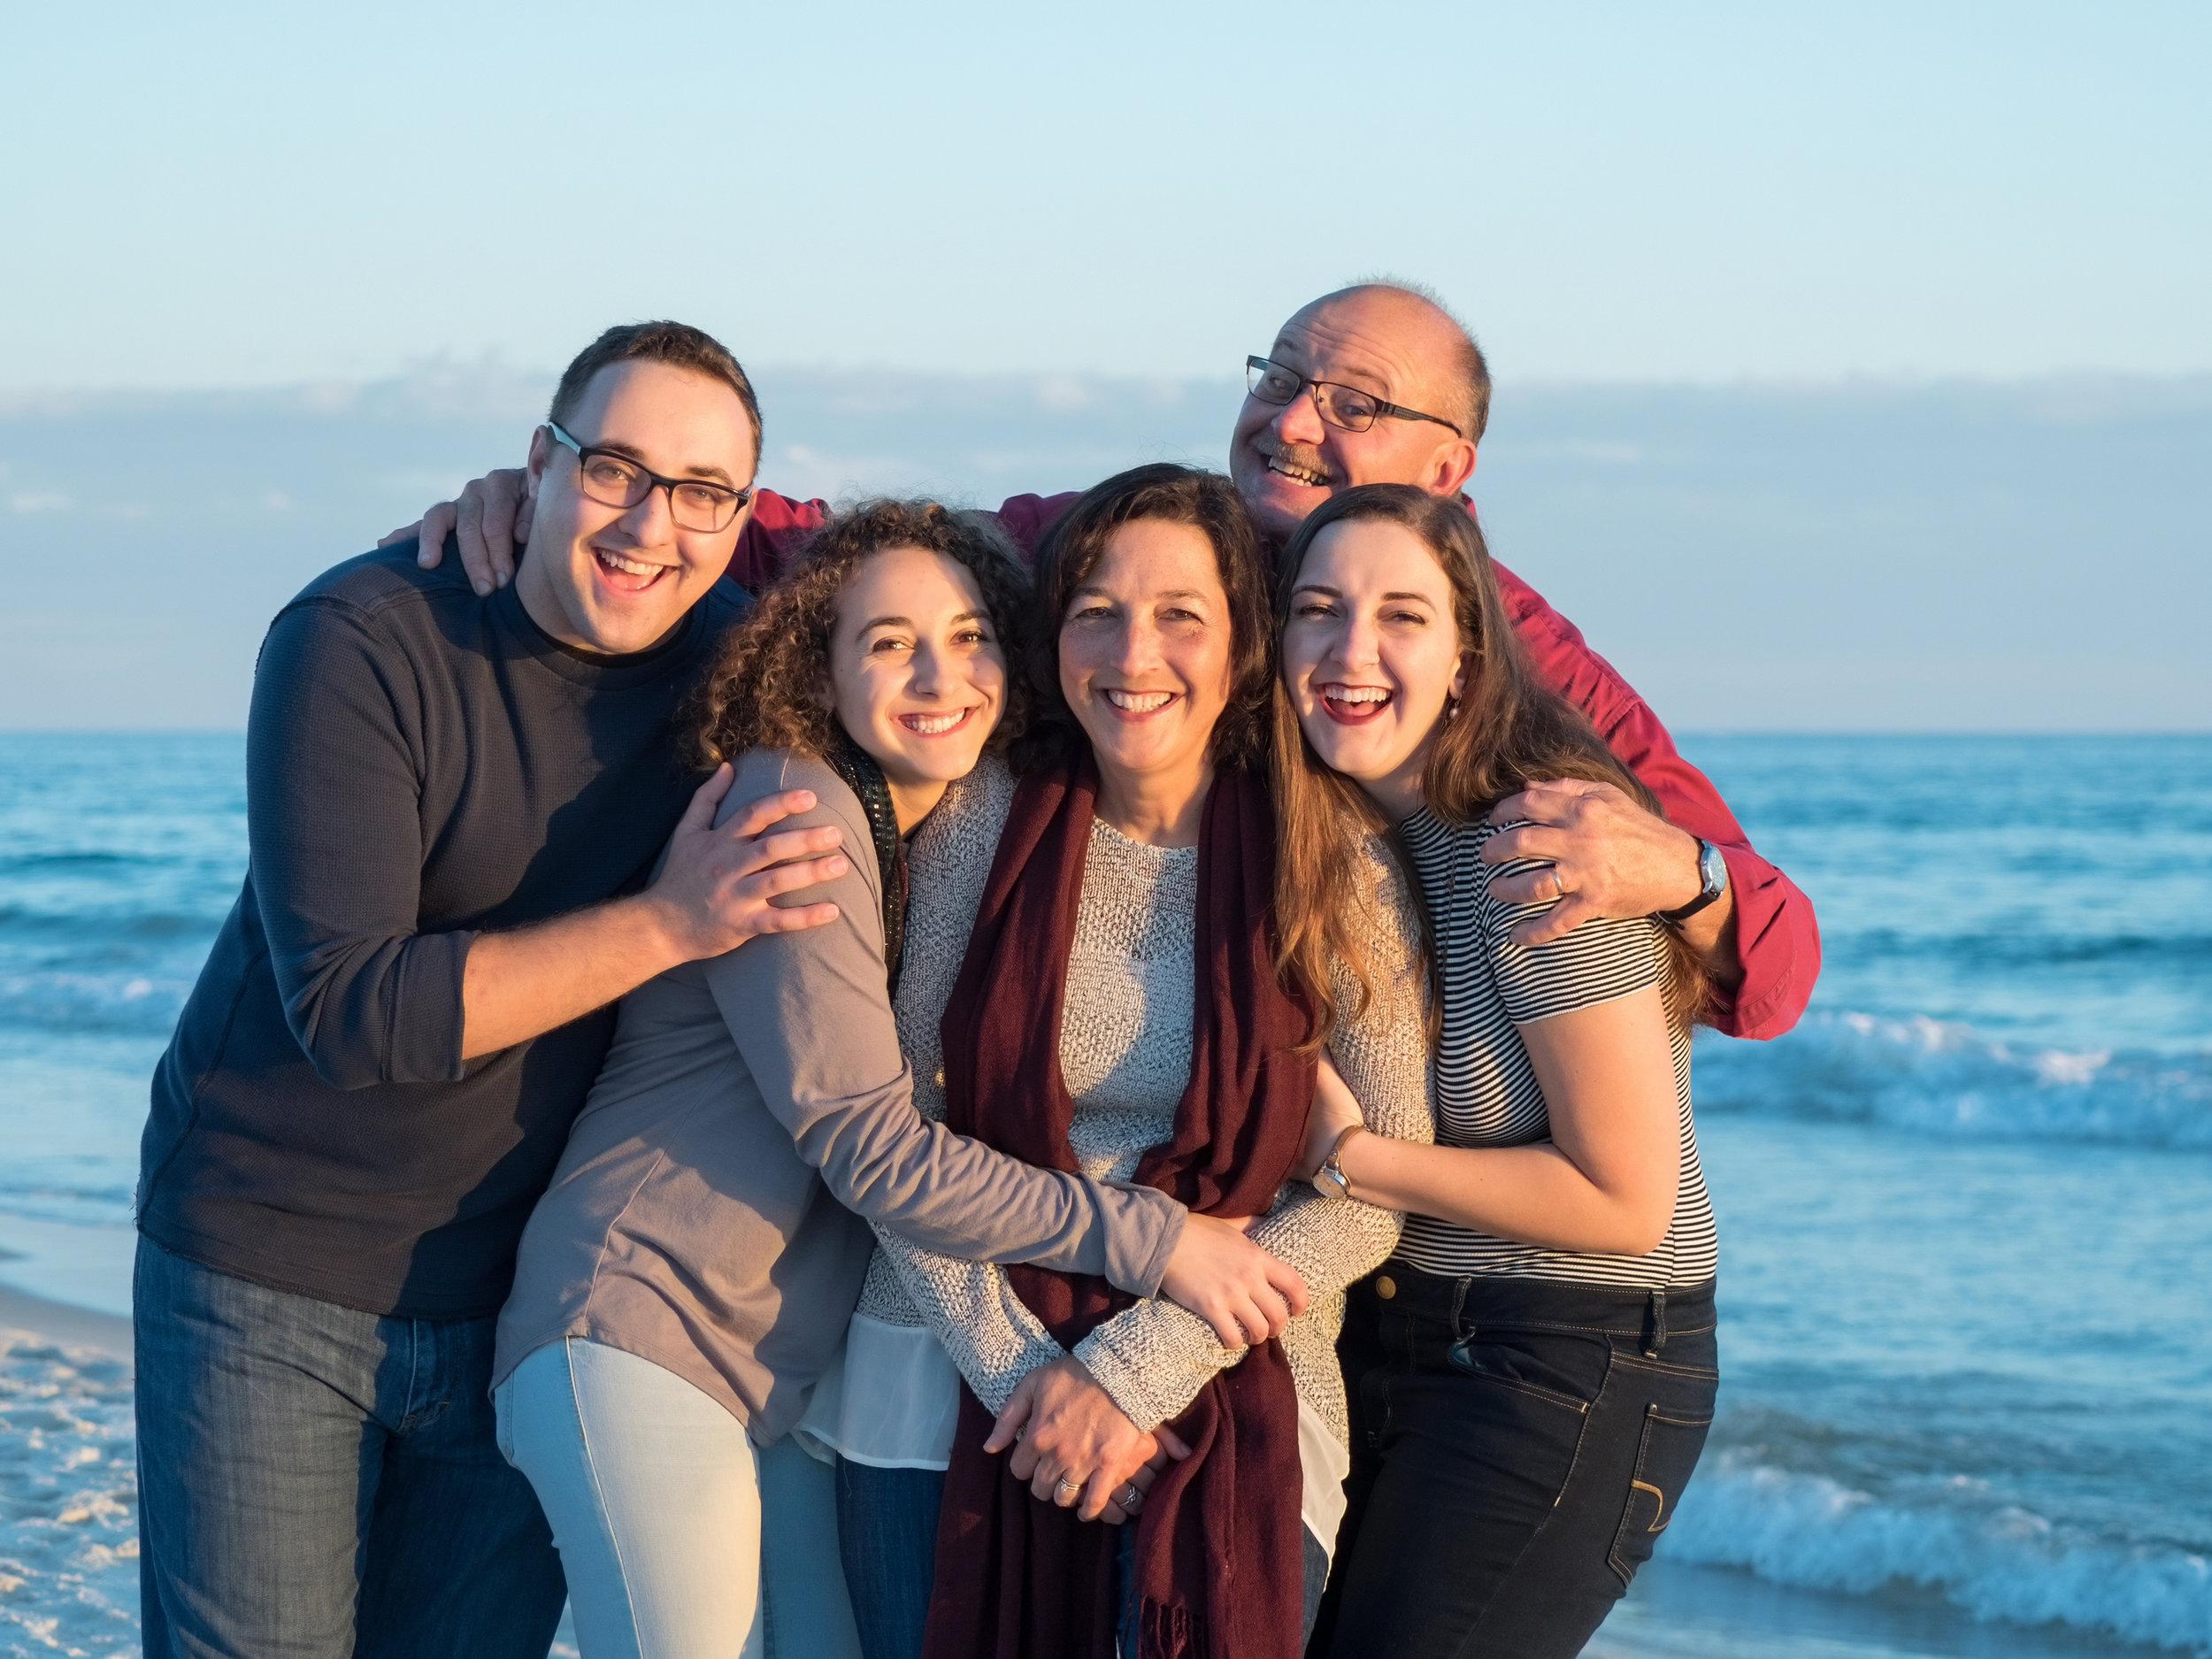 Gulf-Shores-Family-15.jpg